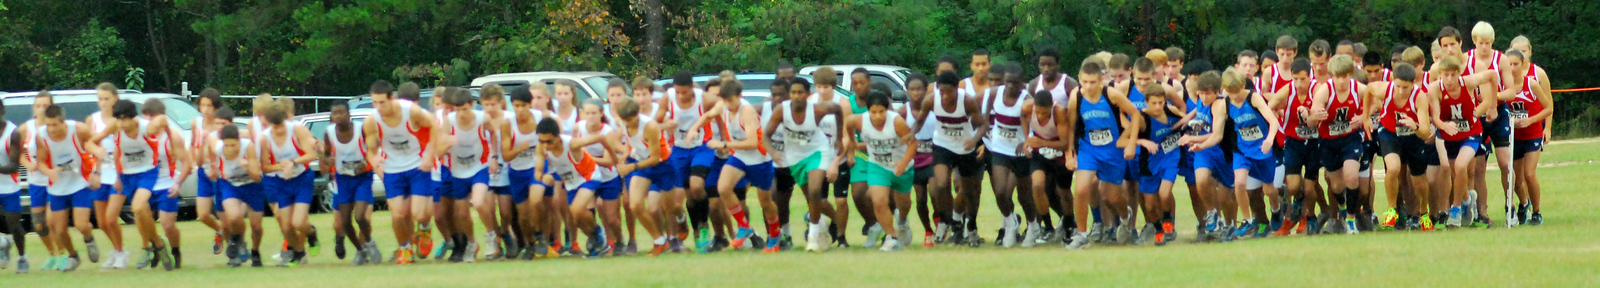 CHS Boy's XC Team